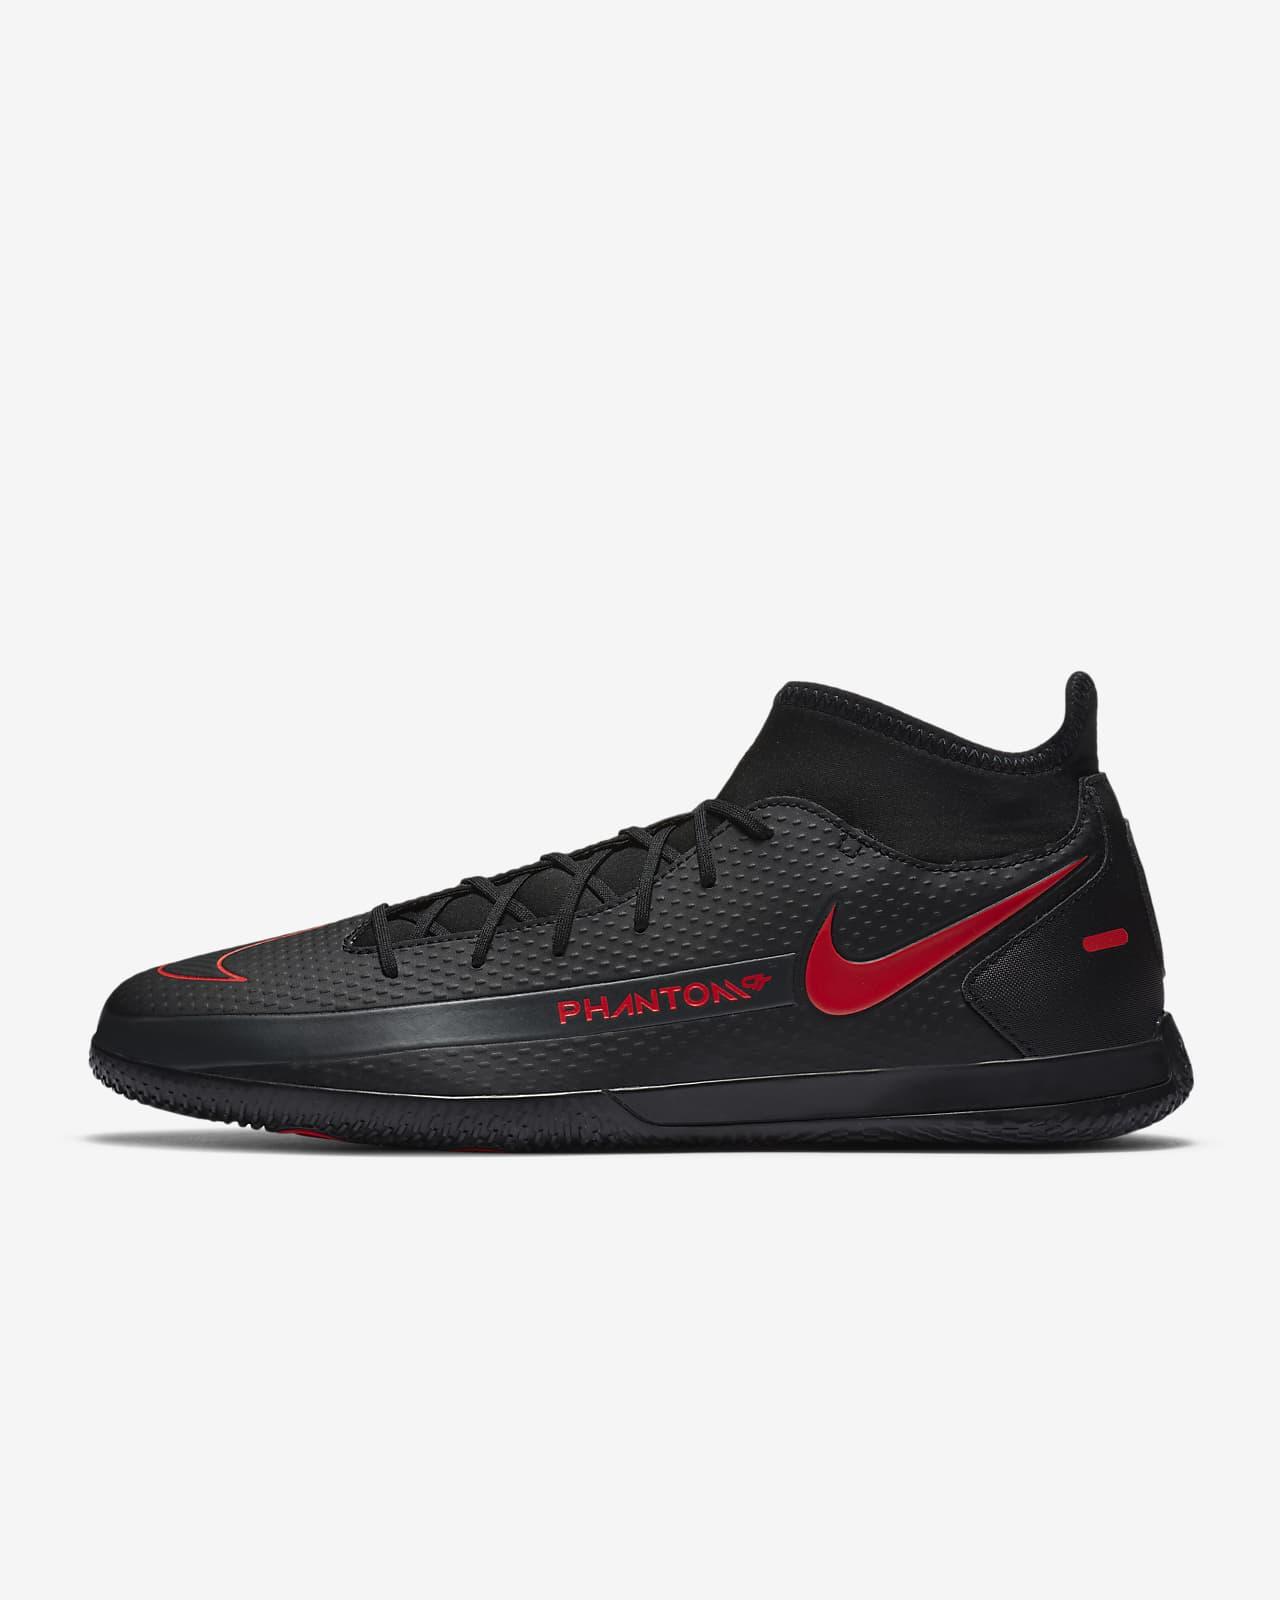 Nike Phantom GT Club Dynamic Fit IC Indoor Court Football Shoe